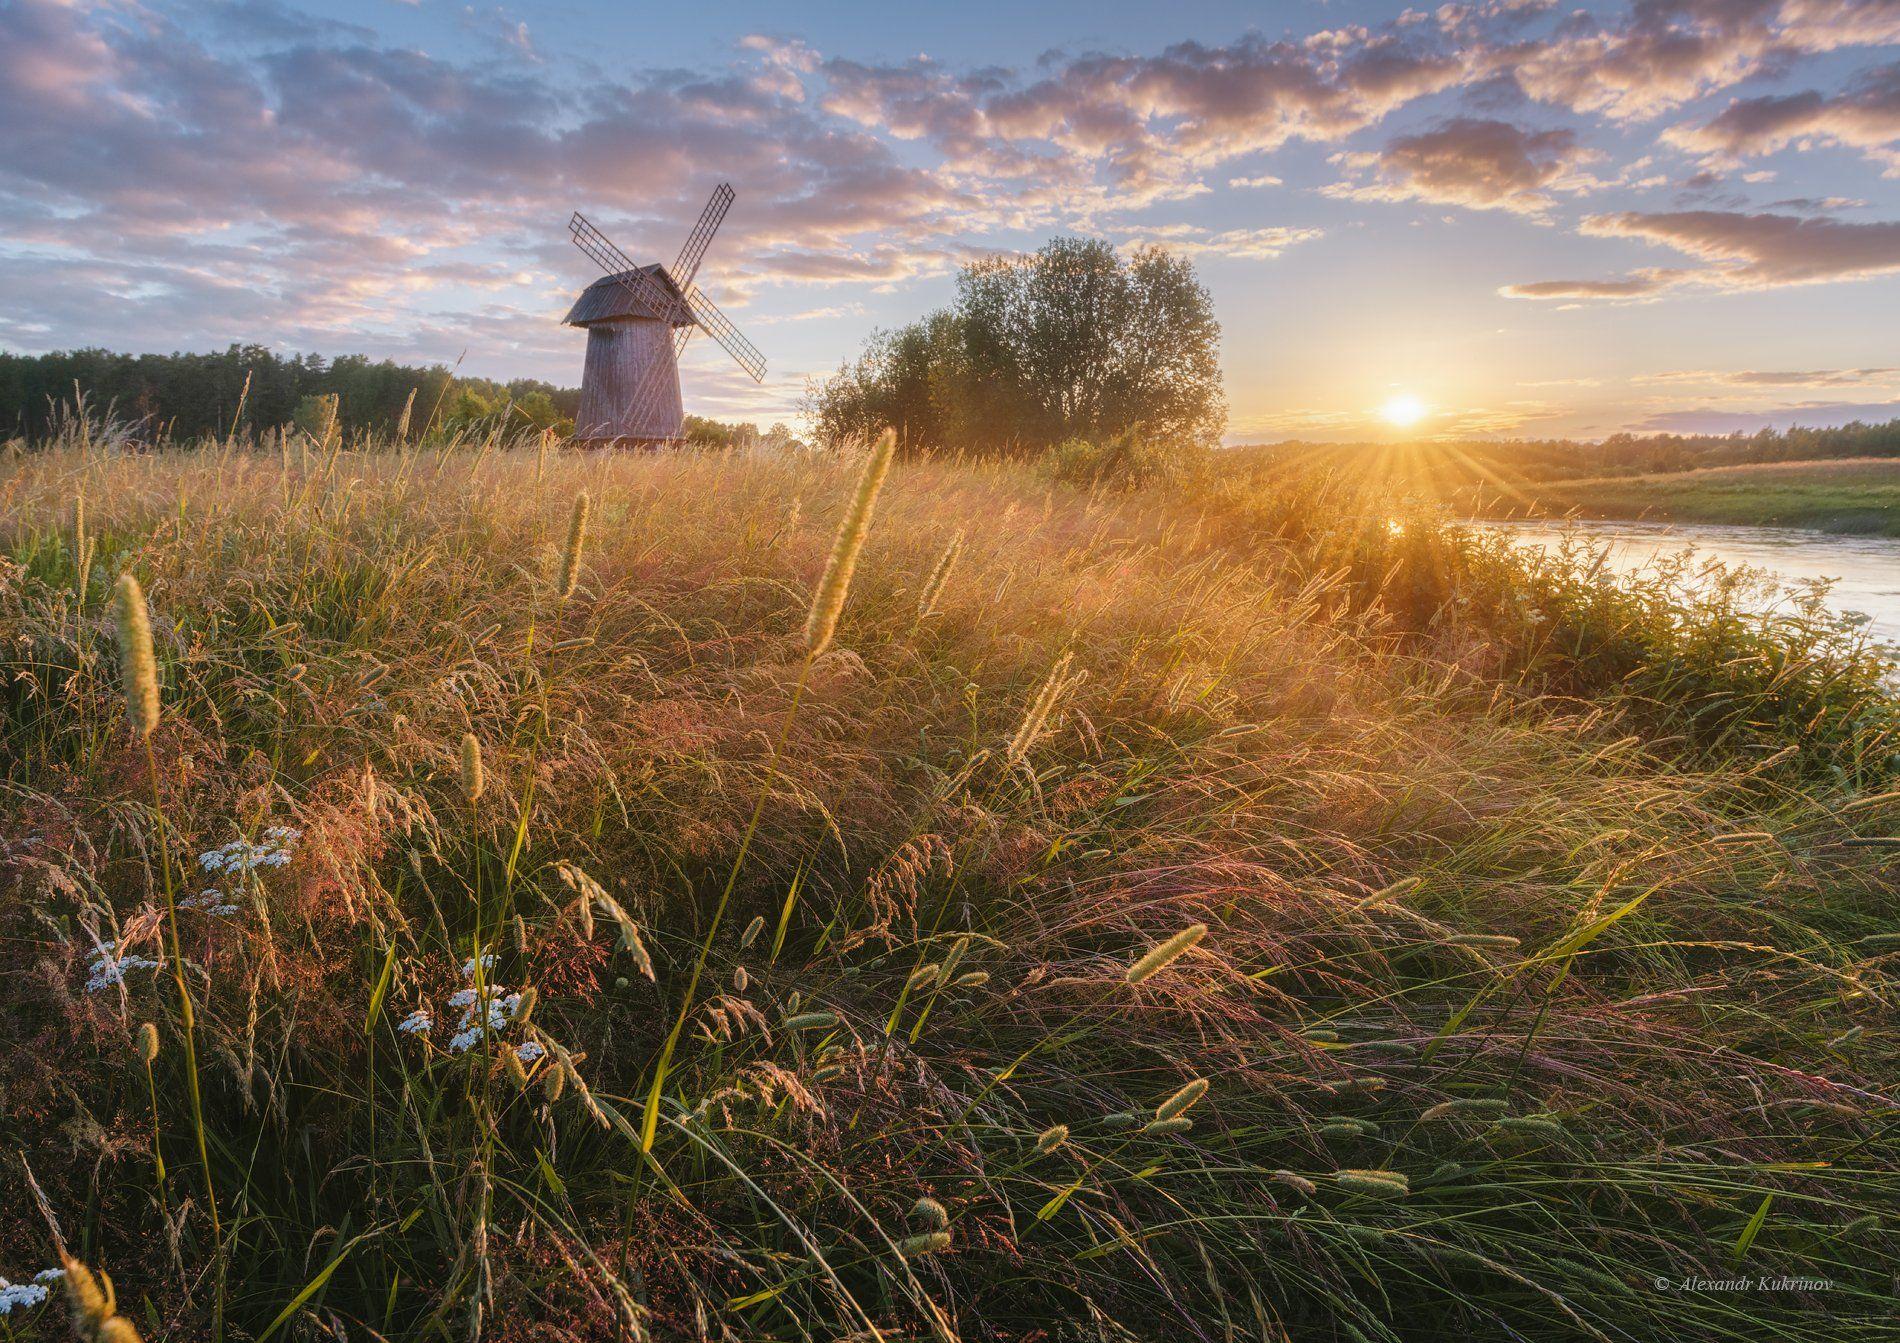 пушгоры,пезаж,лето,закат, Александр Кукринов